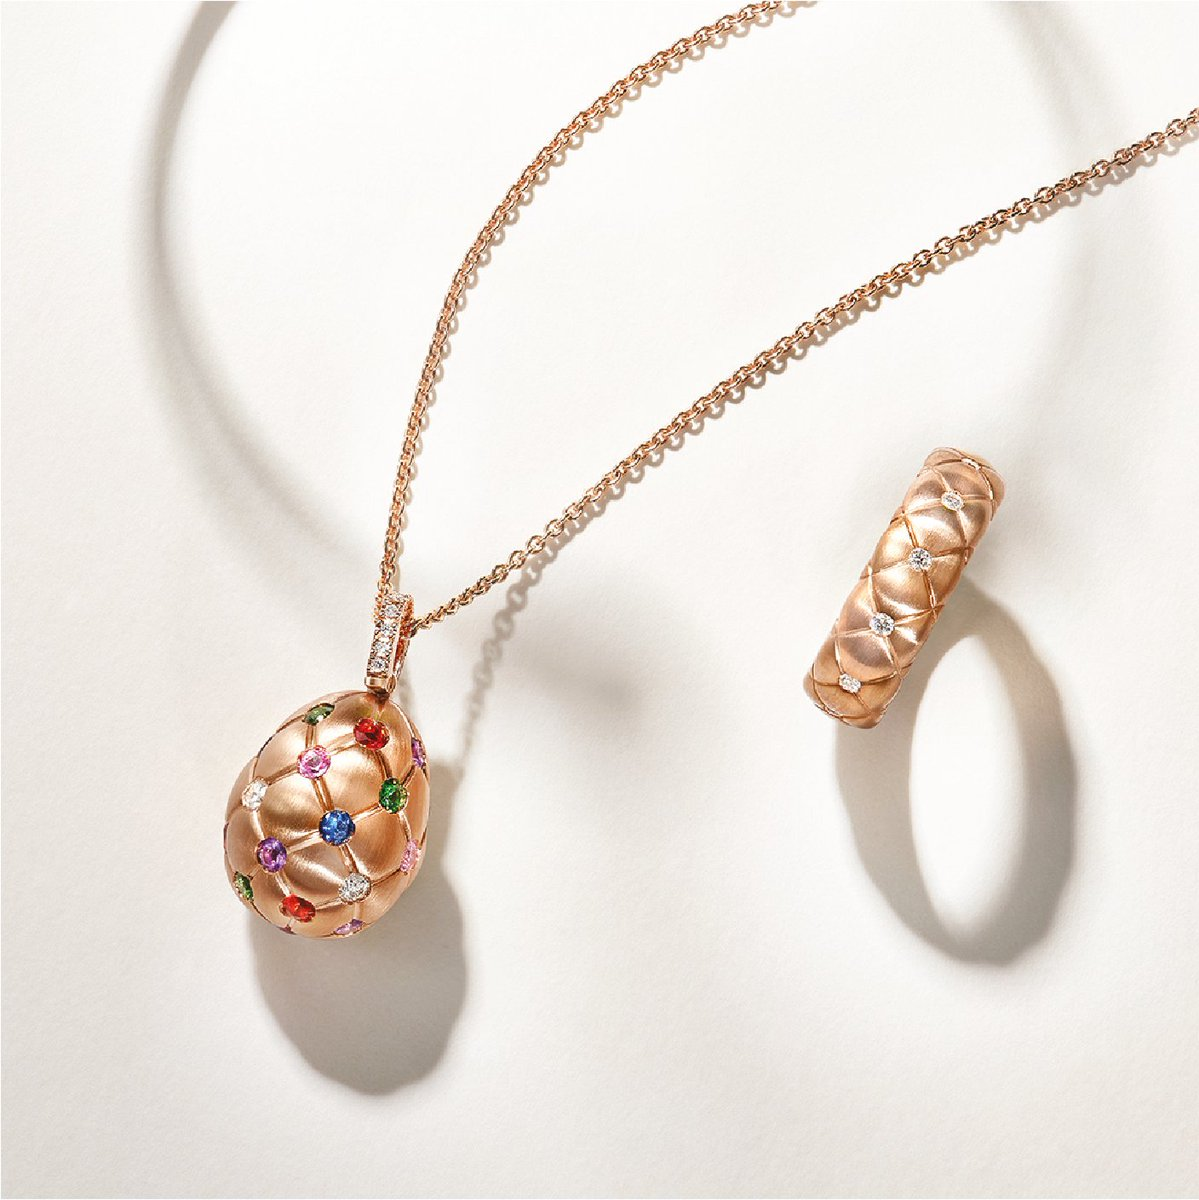 Damas Jewellery On Twitter Creating